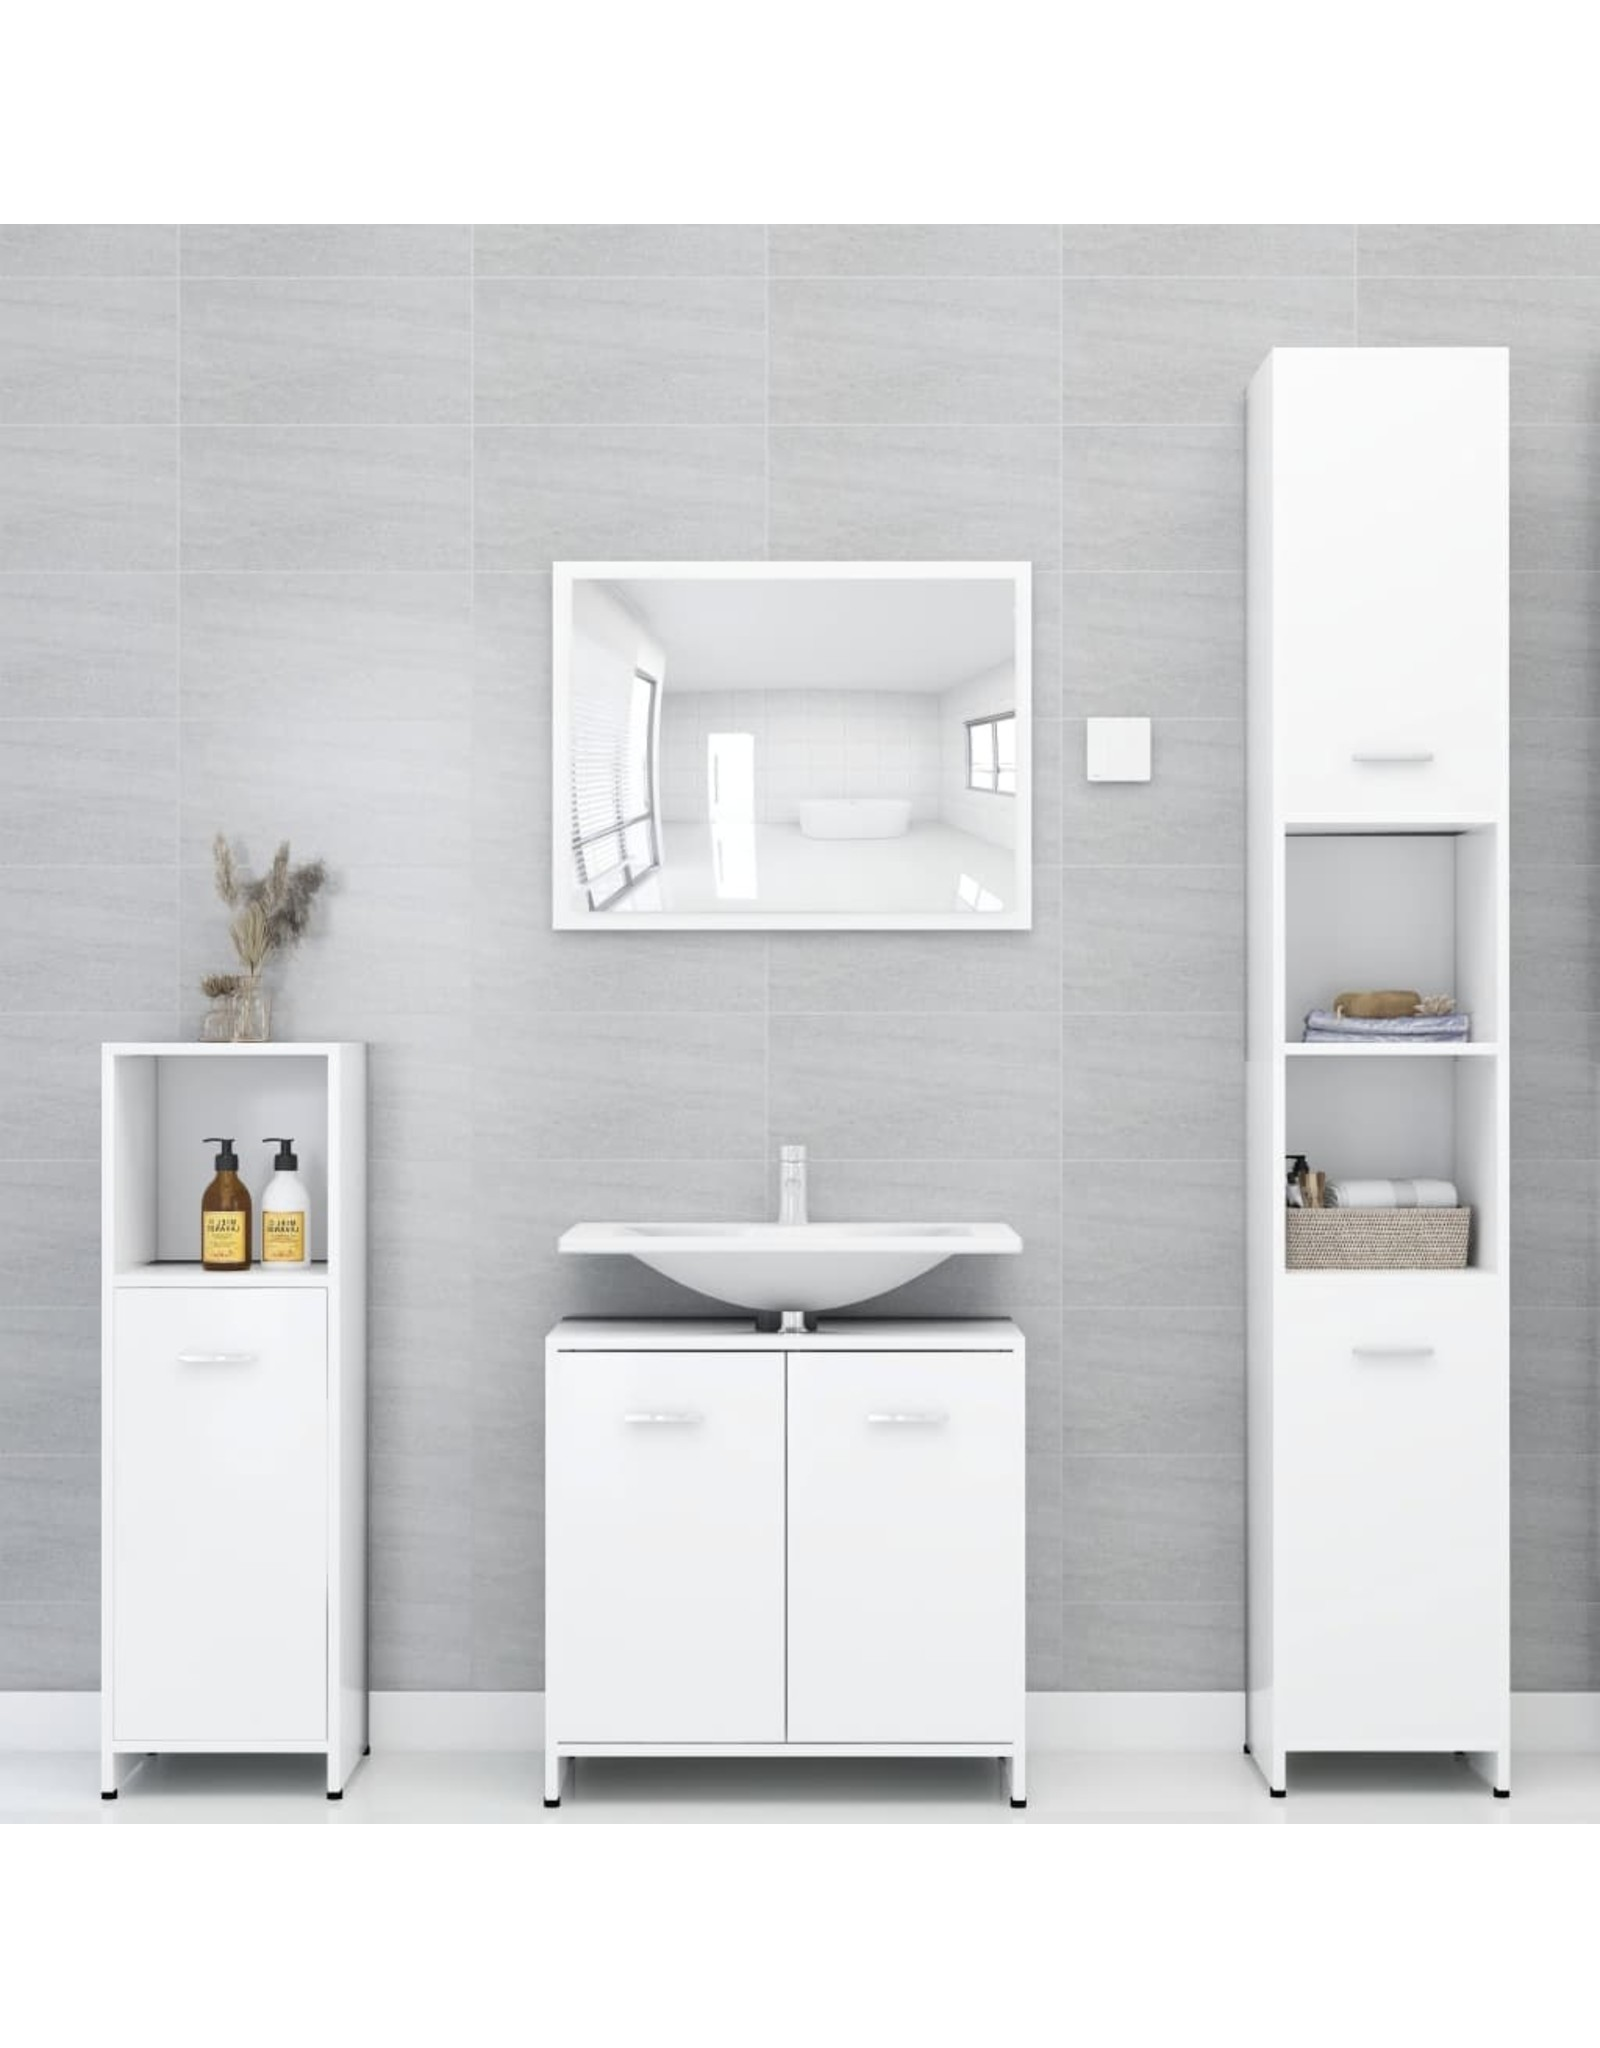 4-delige Badkamermeubelset spaanplaat wit